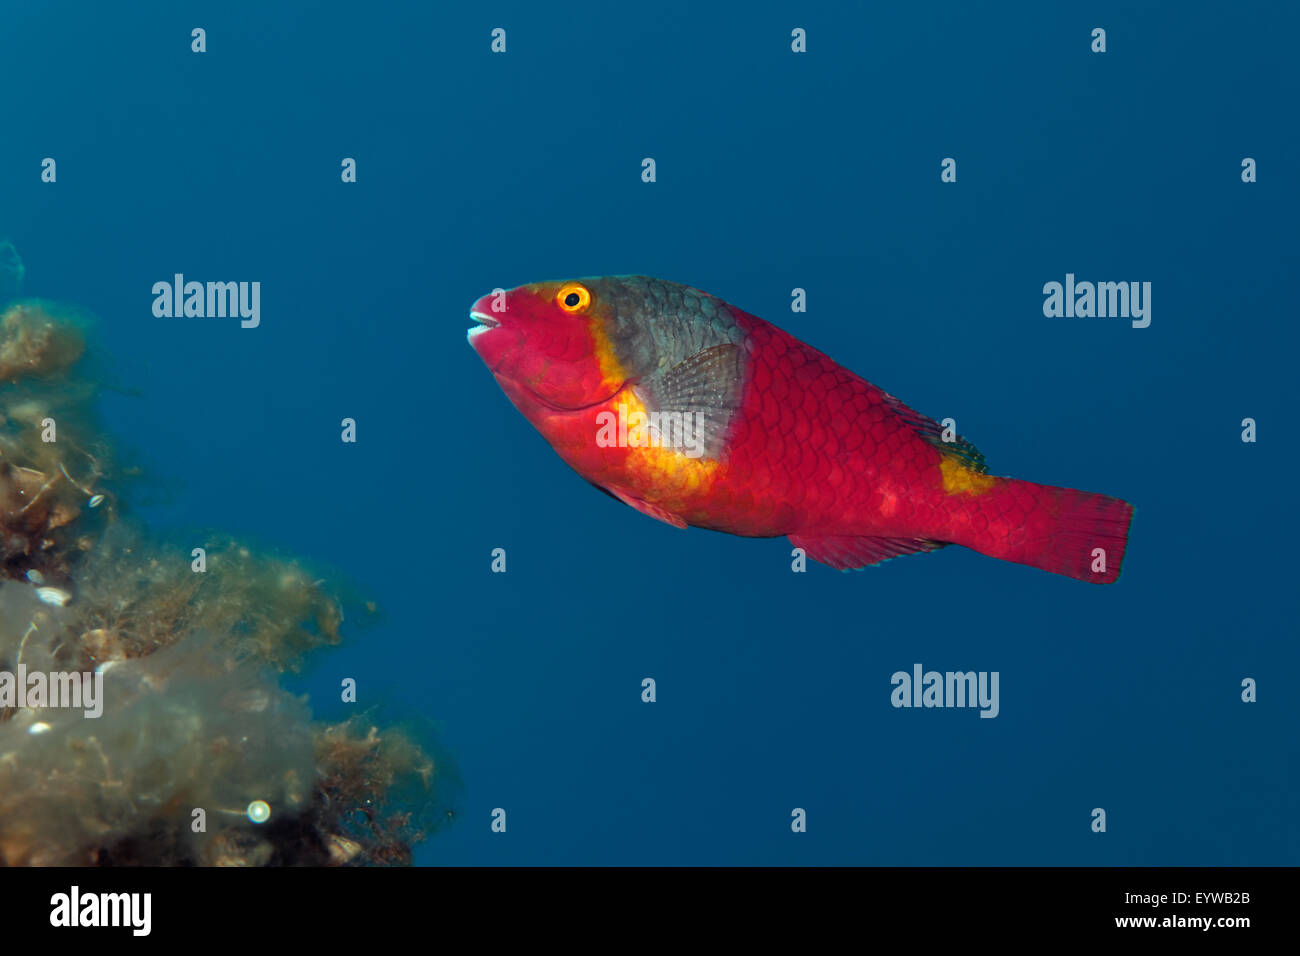 Mediterranean Parrotfish (Sparisoma cretense), Corfu, Ionian Islands, Greece - Stock Image